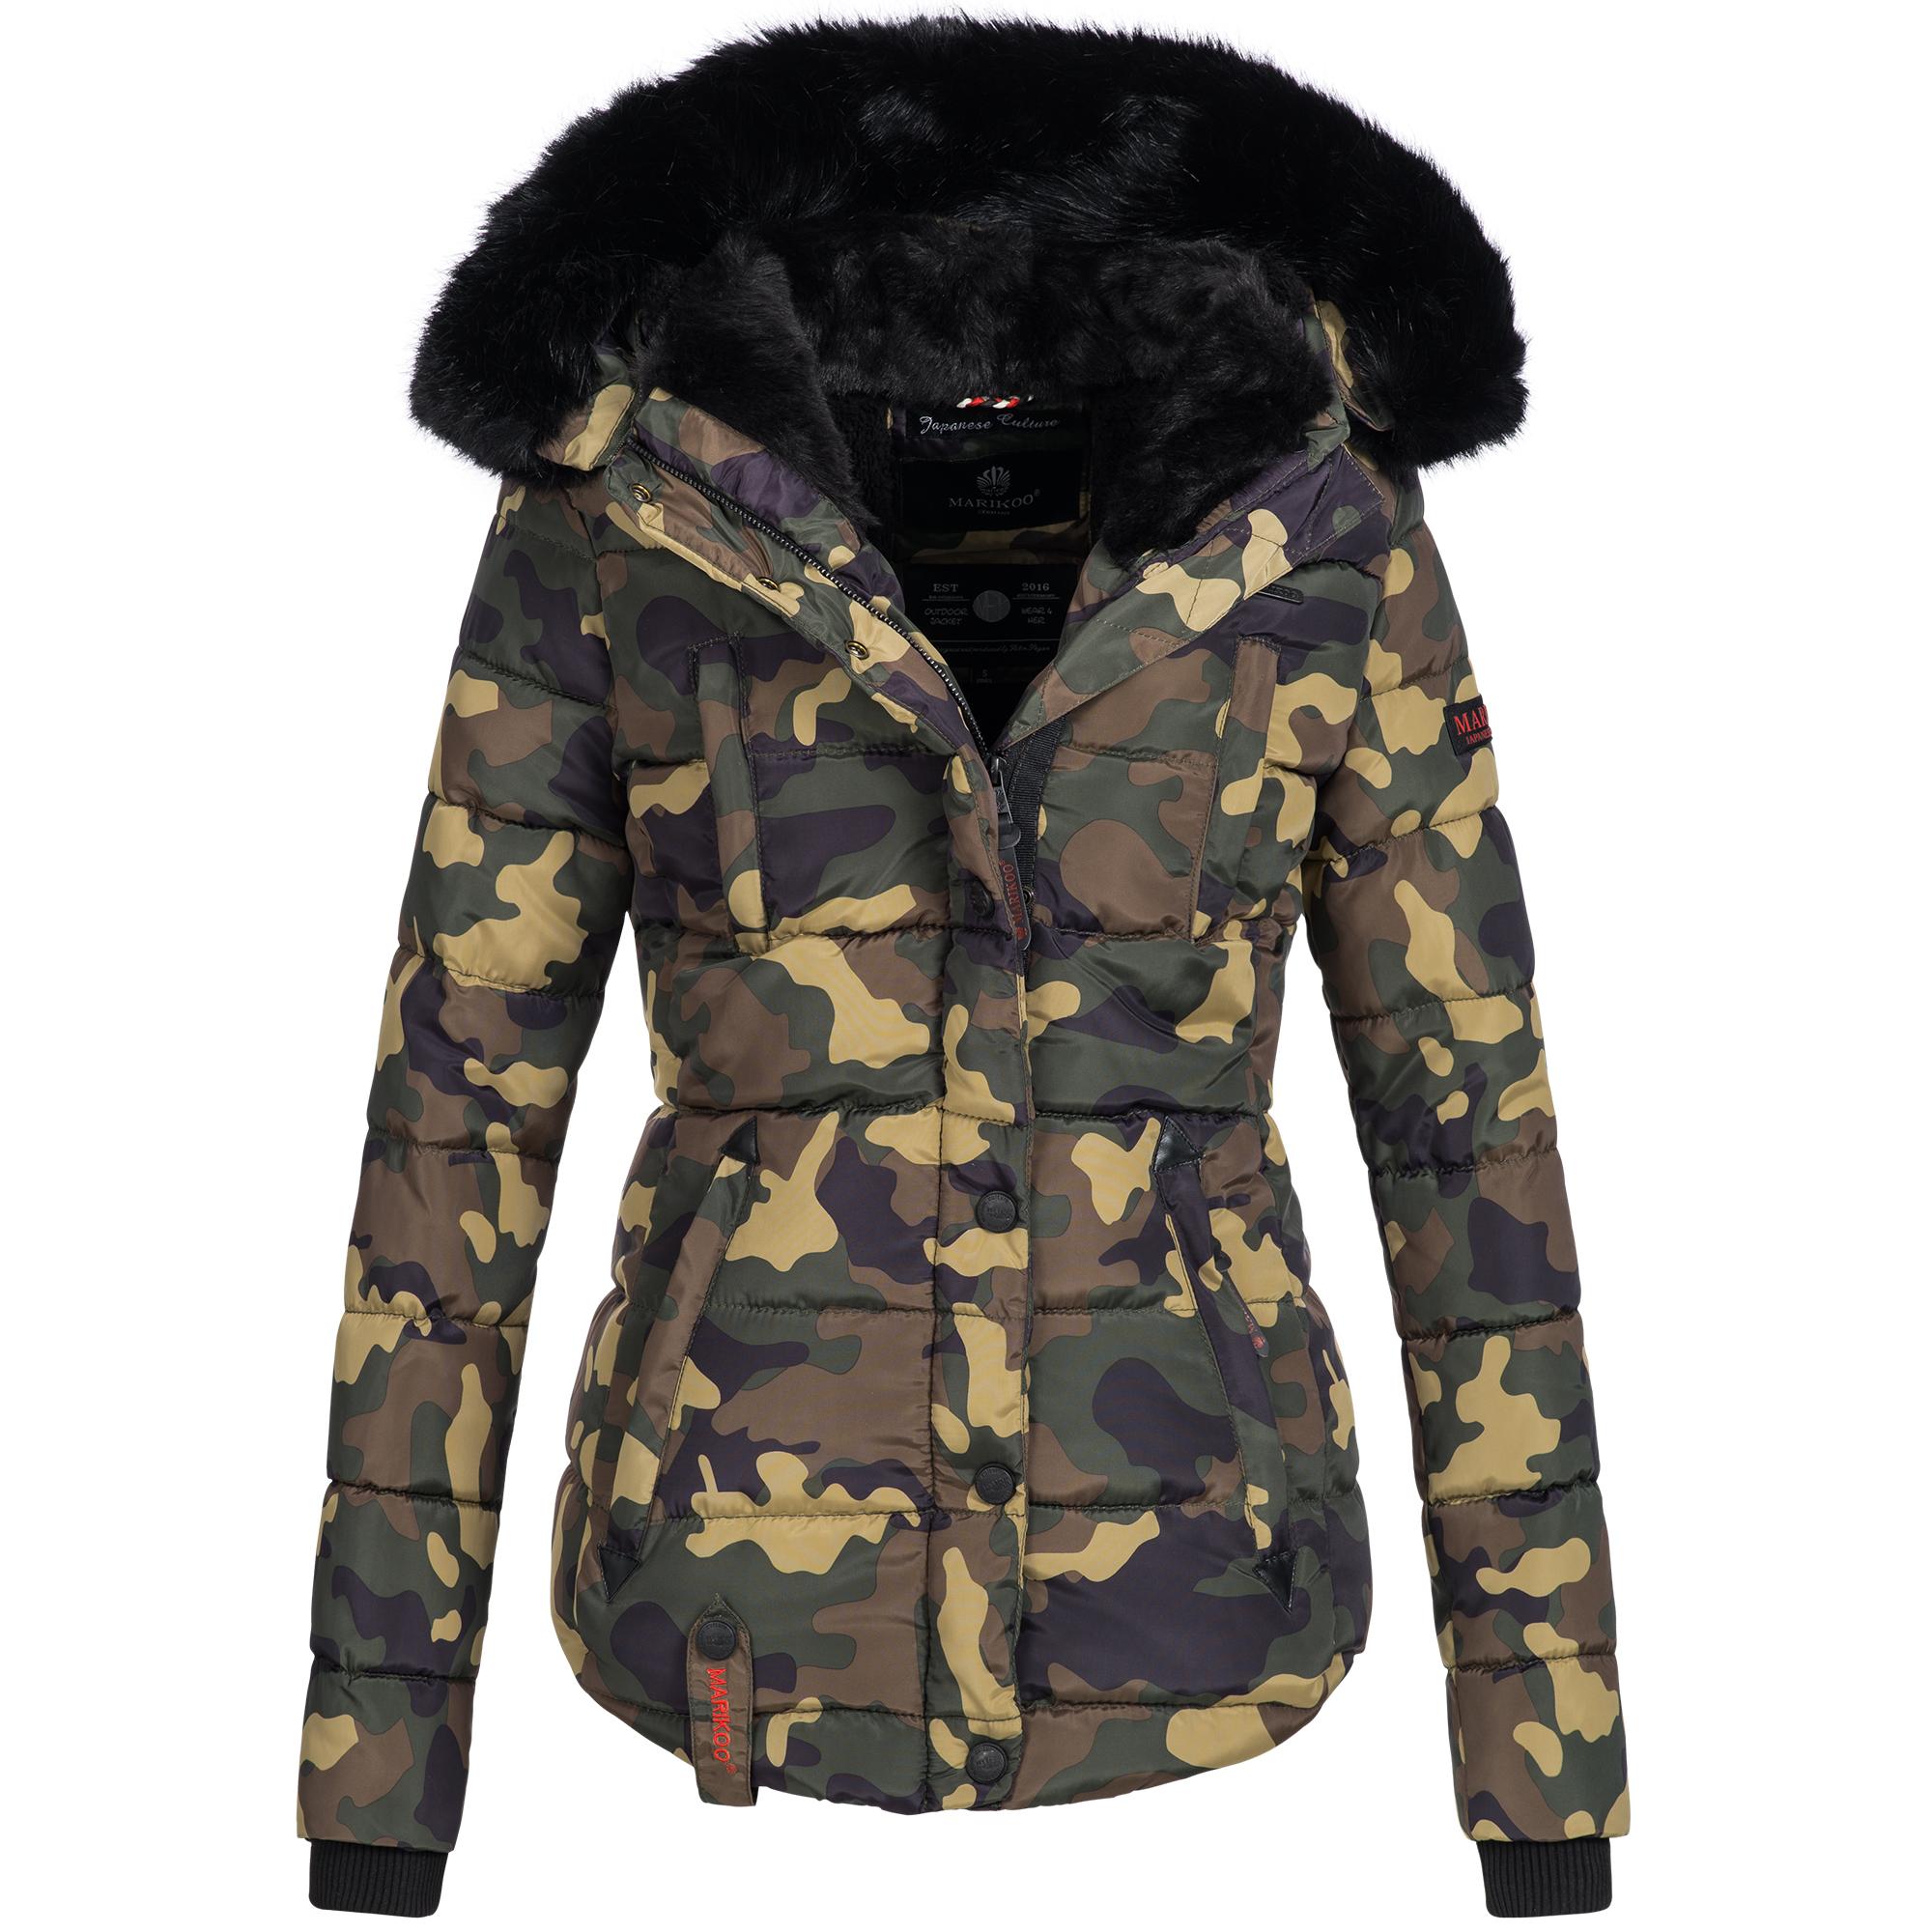 buy popular adb5d c9321 Marikoo LOTUS Damen Jacke Steppjacke Winterjacke warm Parka gefüttert  gesteppt XS-XXL 6-Farben